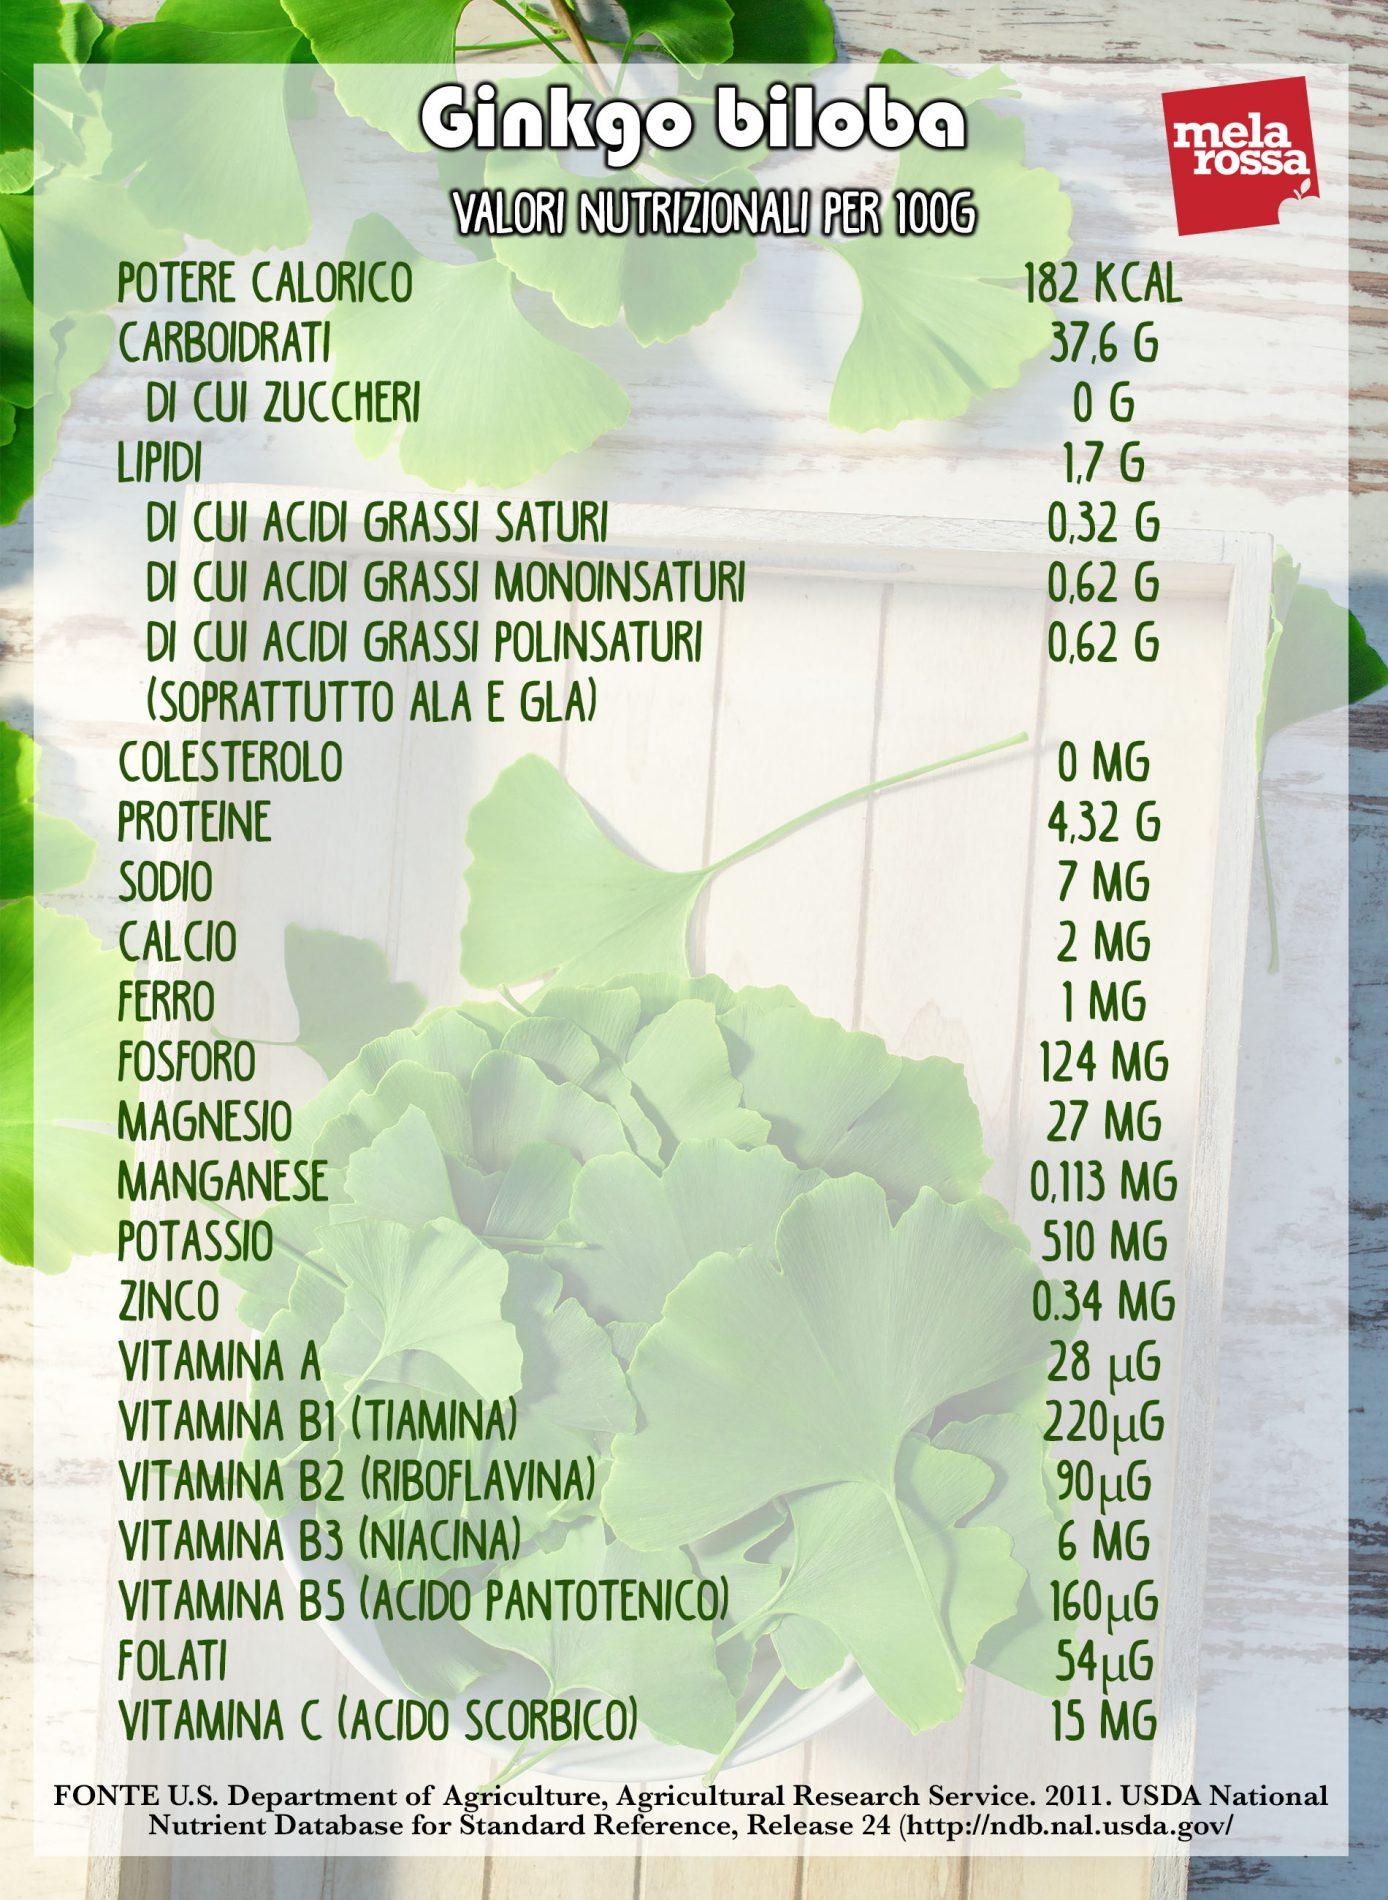 ginkgo biloba: valori nutrizionali